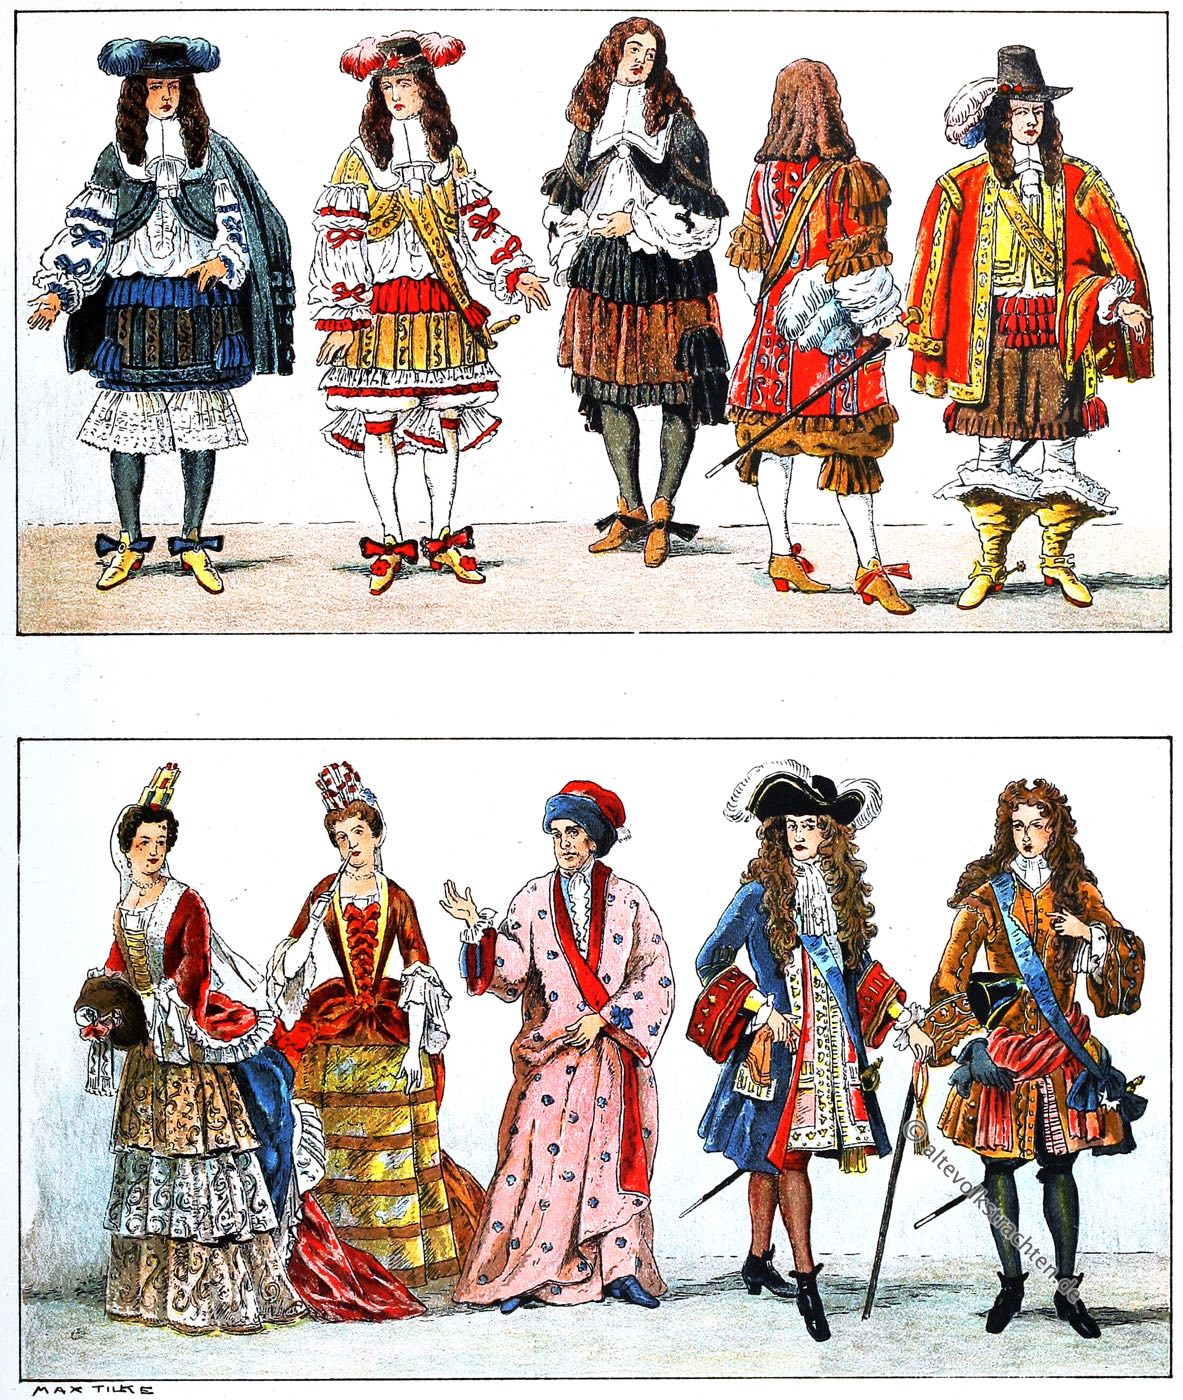 Mode, Ludwig, XIV, Frankreich, Barock, Kostümgeschichte, Adolf Rosenberg, Eduard Heyck,